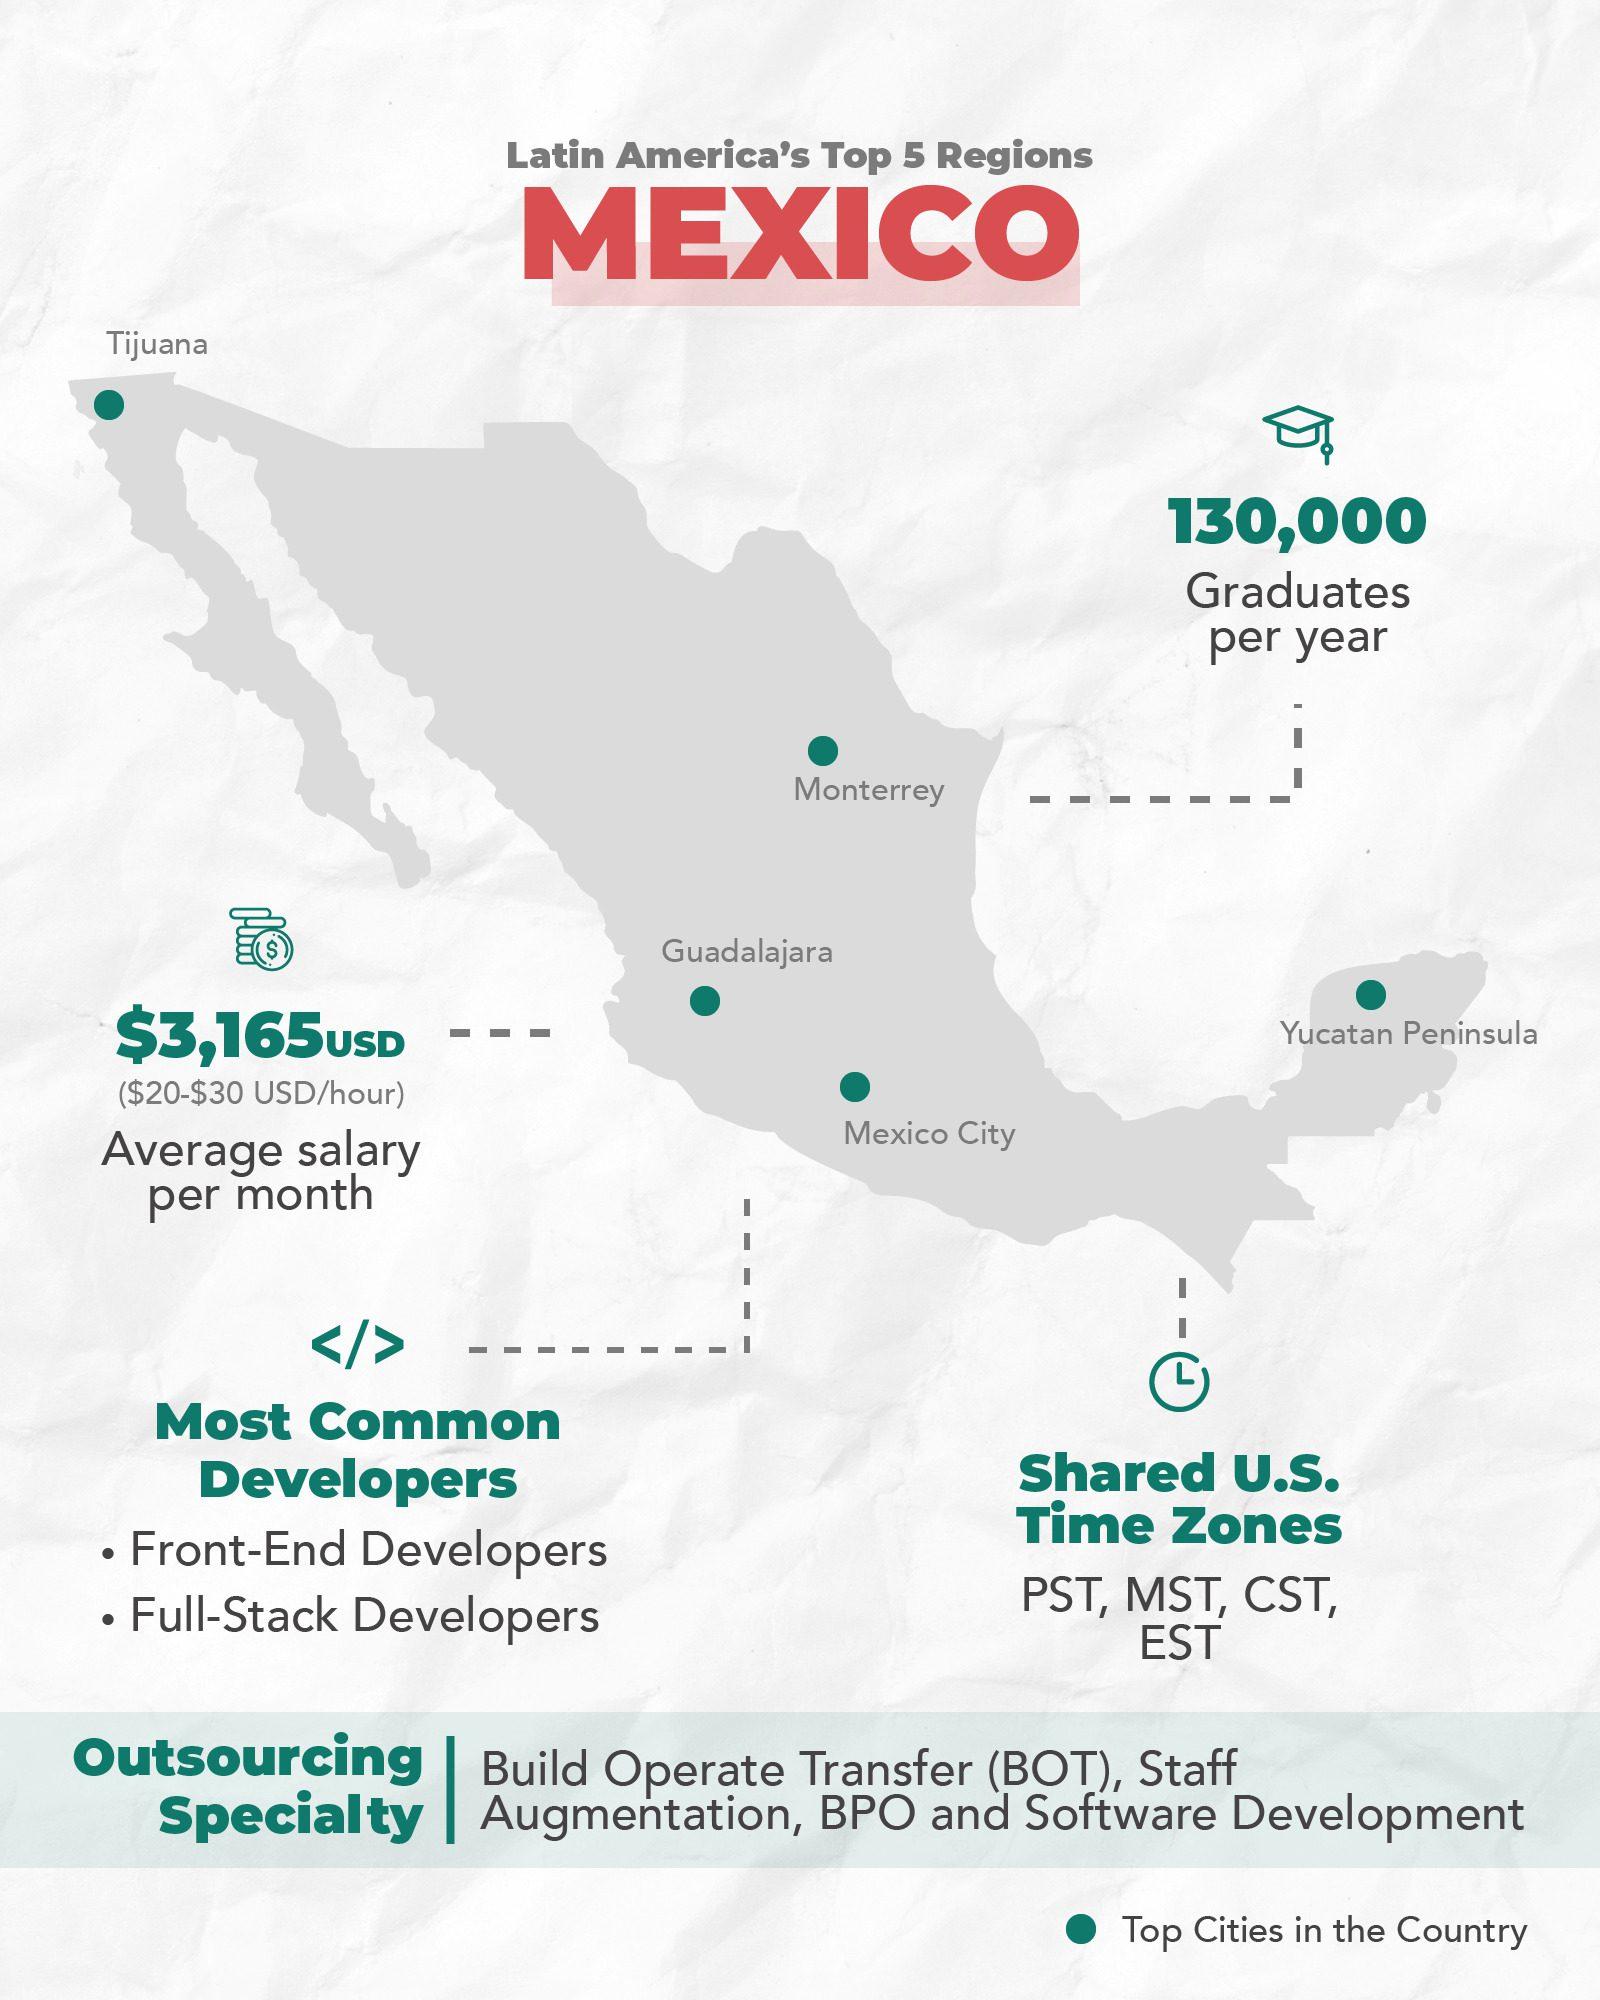 Mexico's Tech Ecosystem